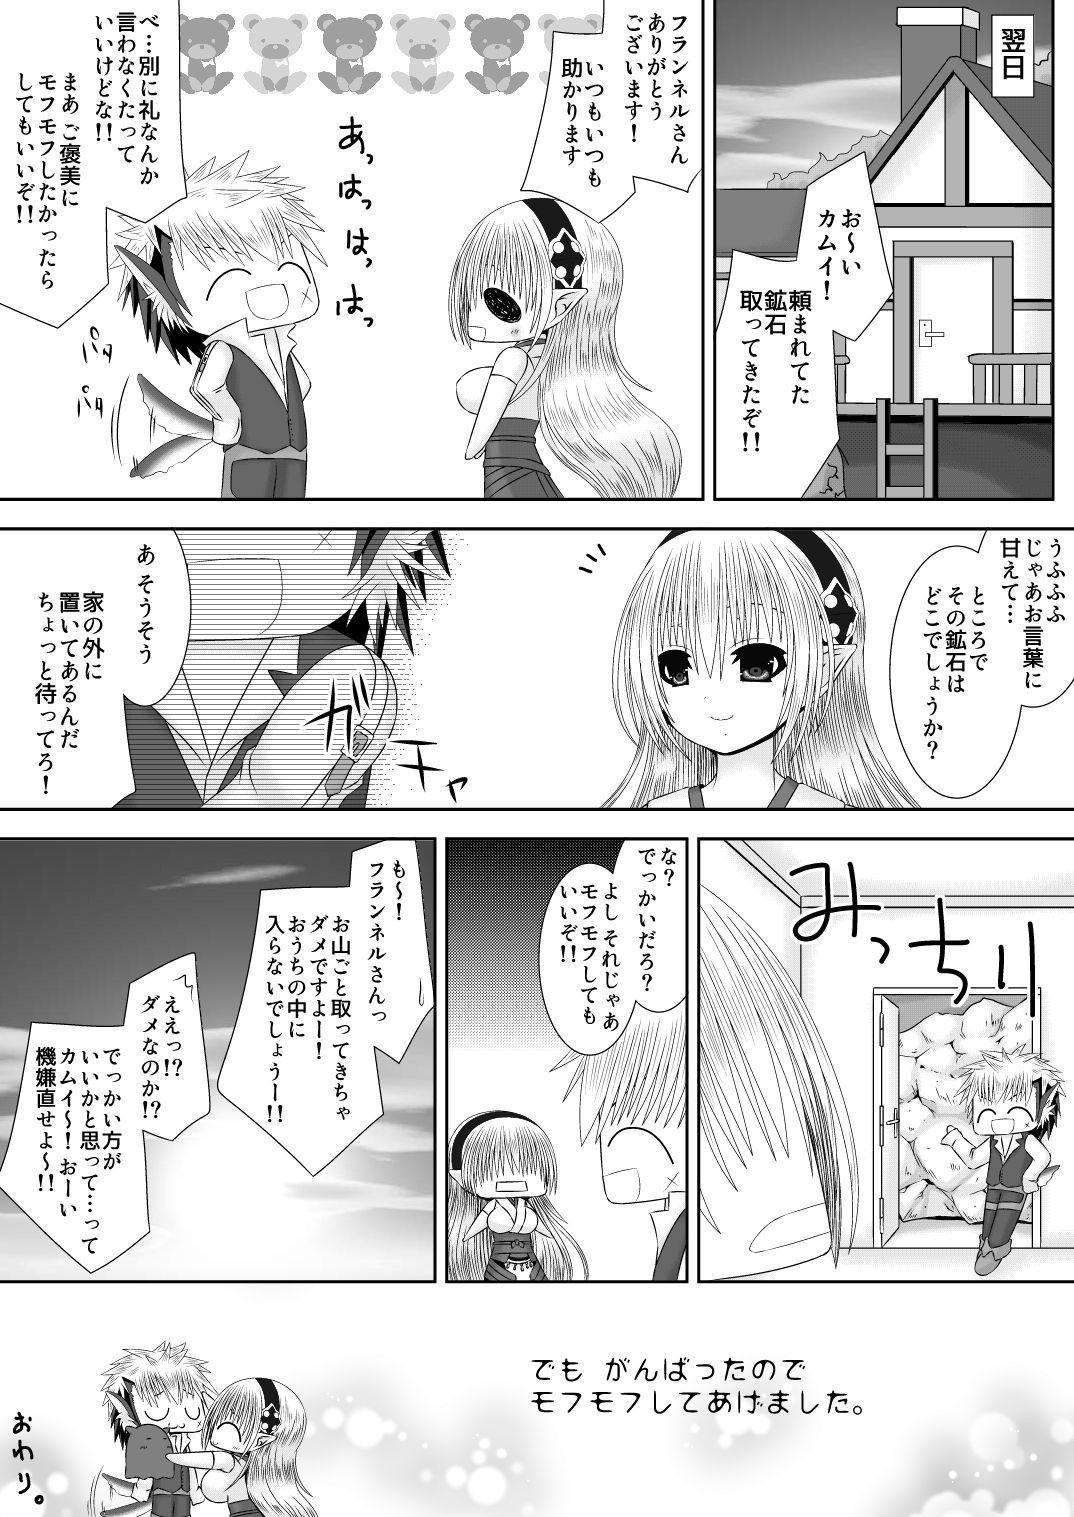 [Oda Natsuki] Ookami-san to Ohime-sama (Fire Emblem if) 18